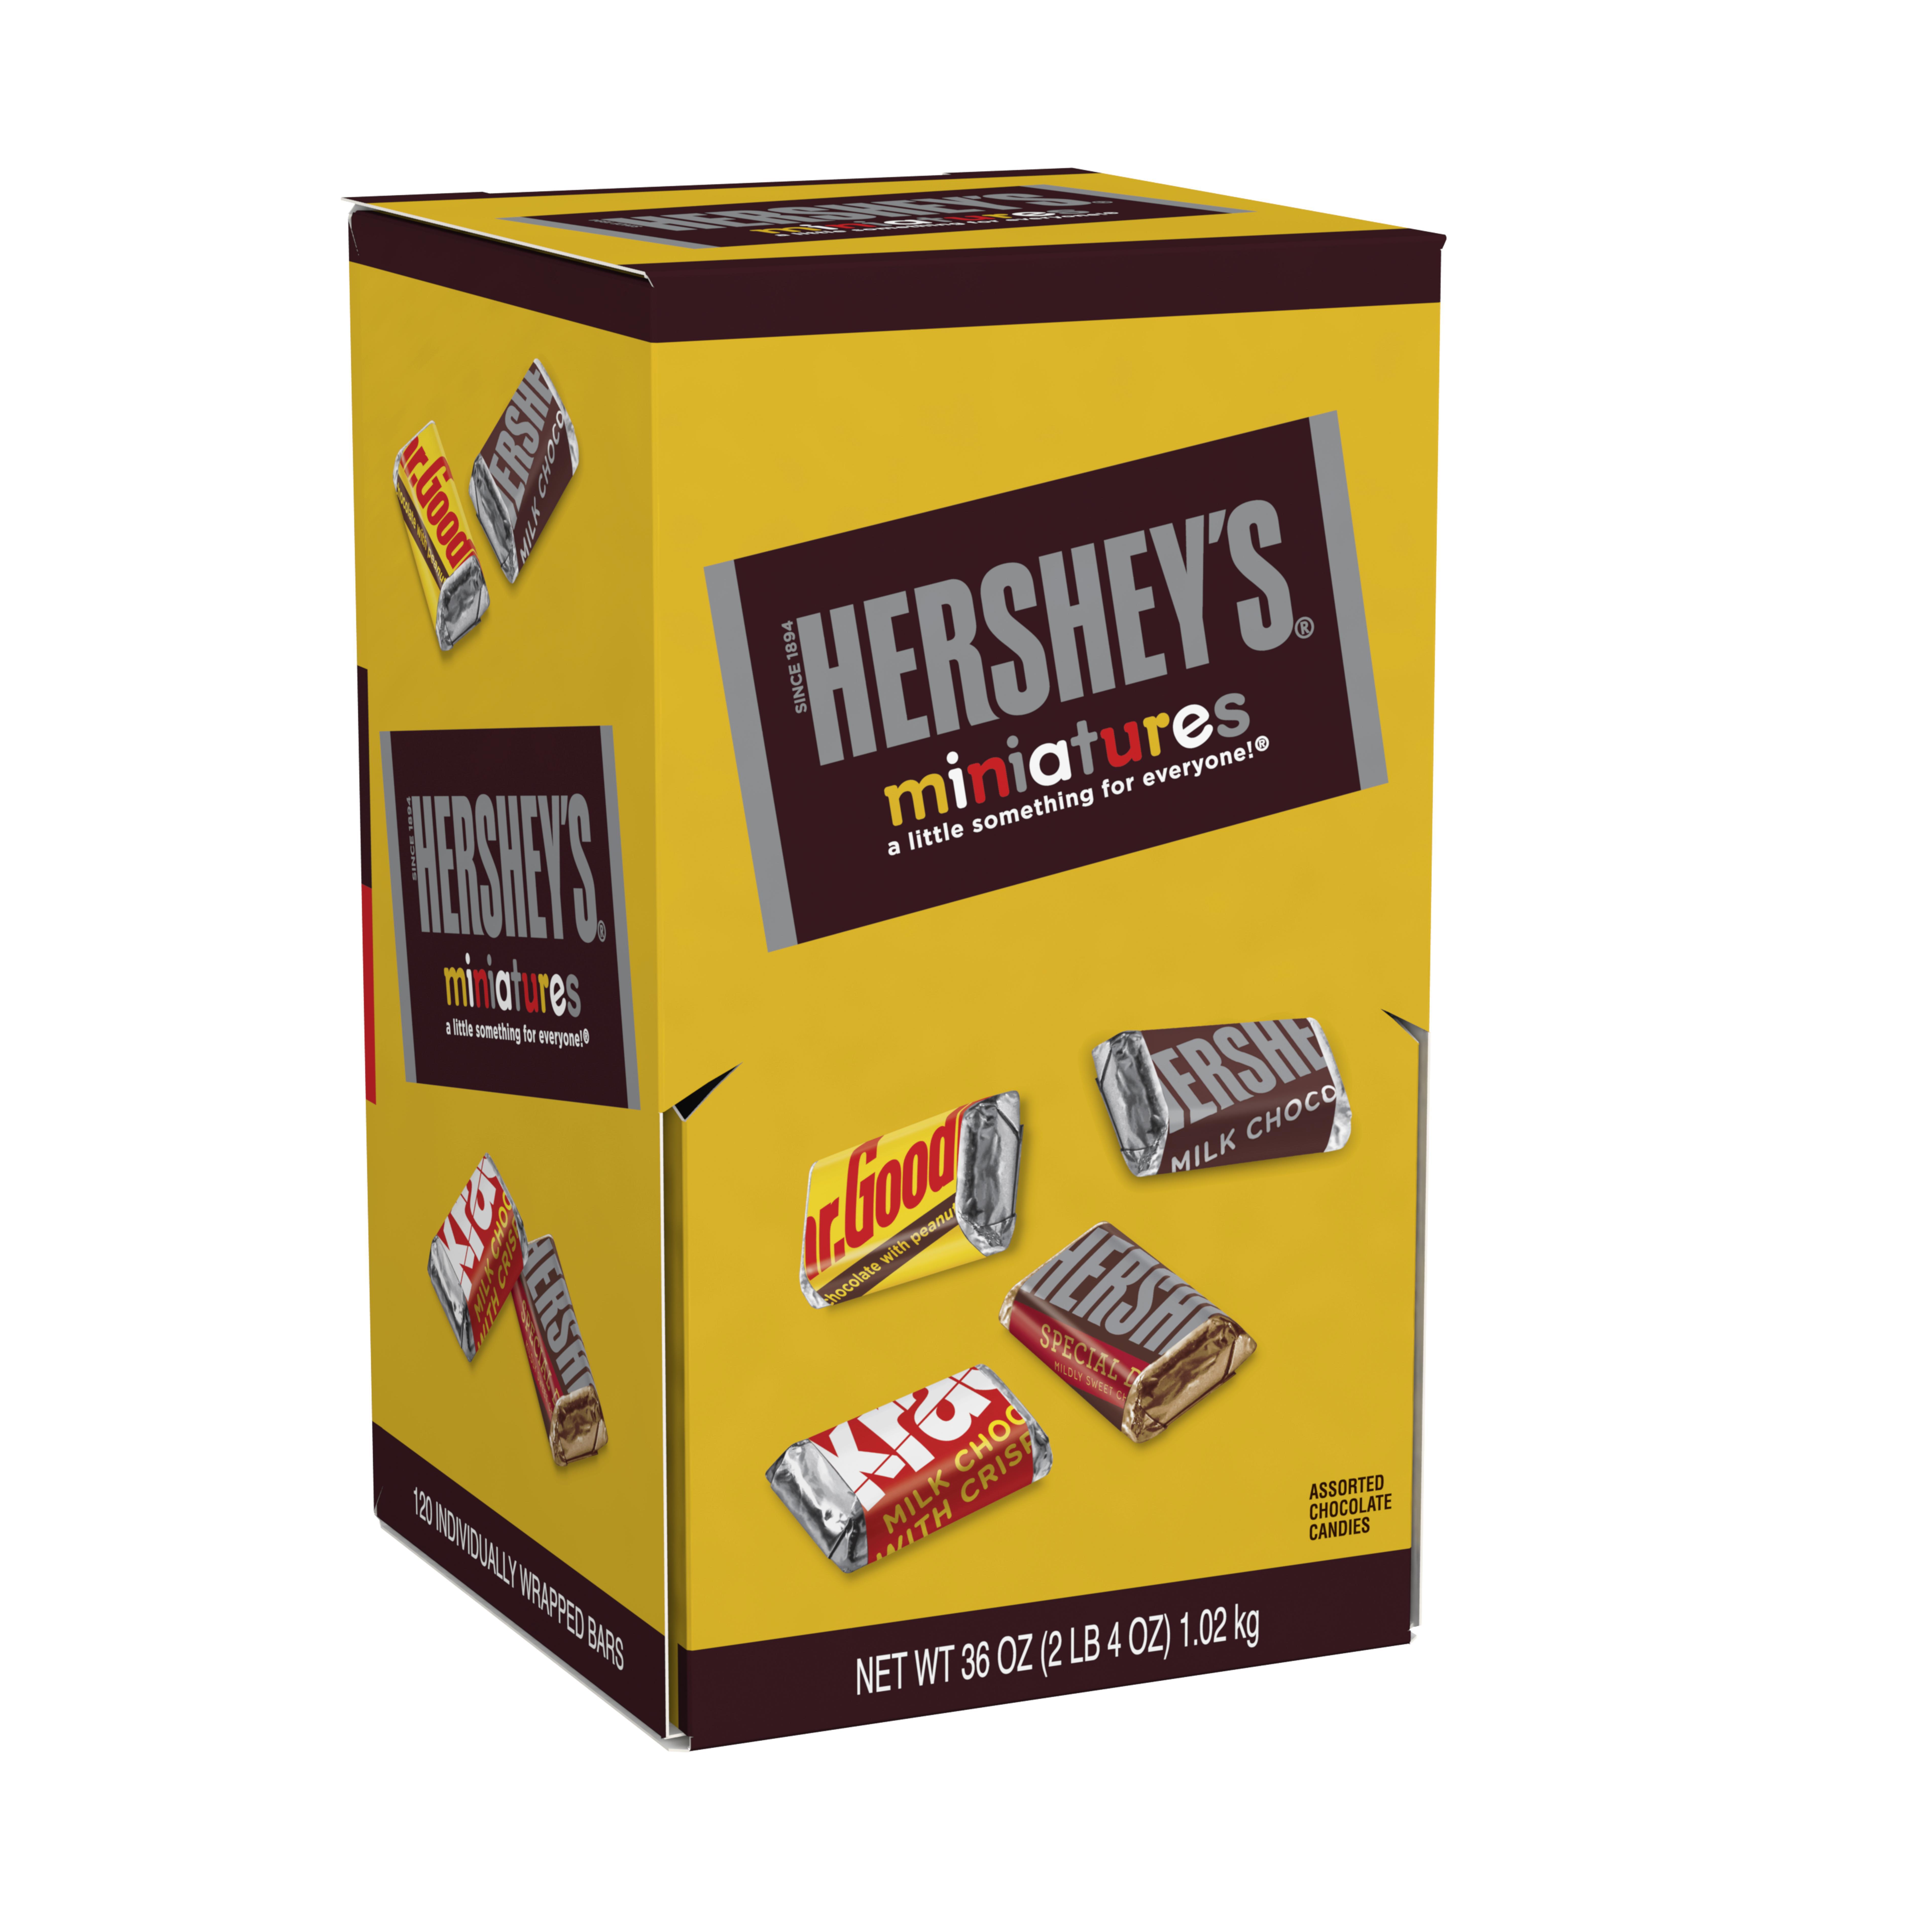 Hershey's Miniatures, Chocolate Candy Assortment, 36 Oz, 120 Ct